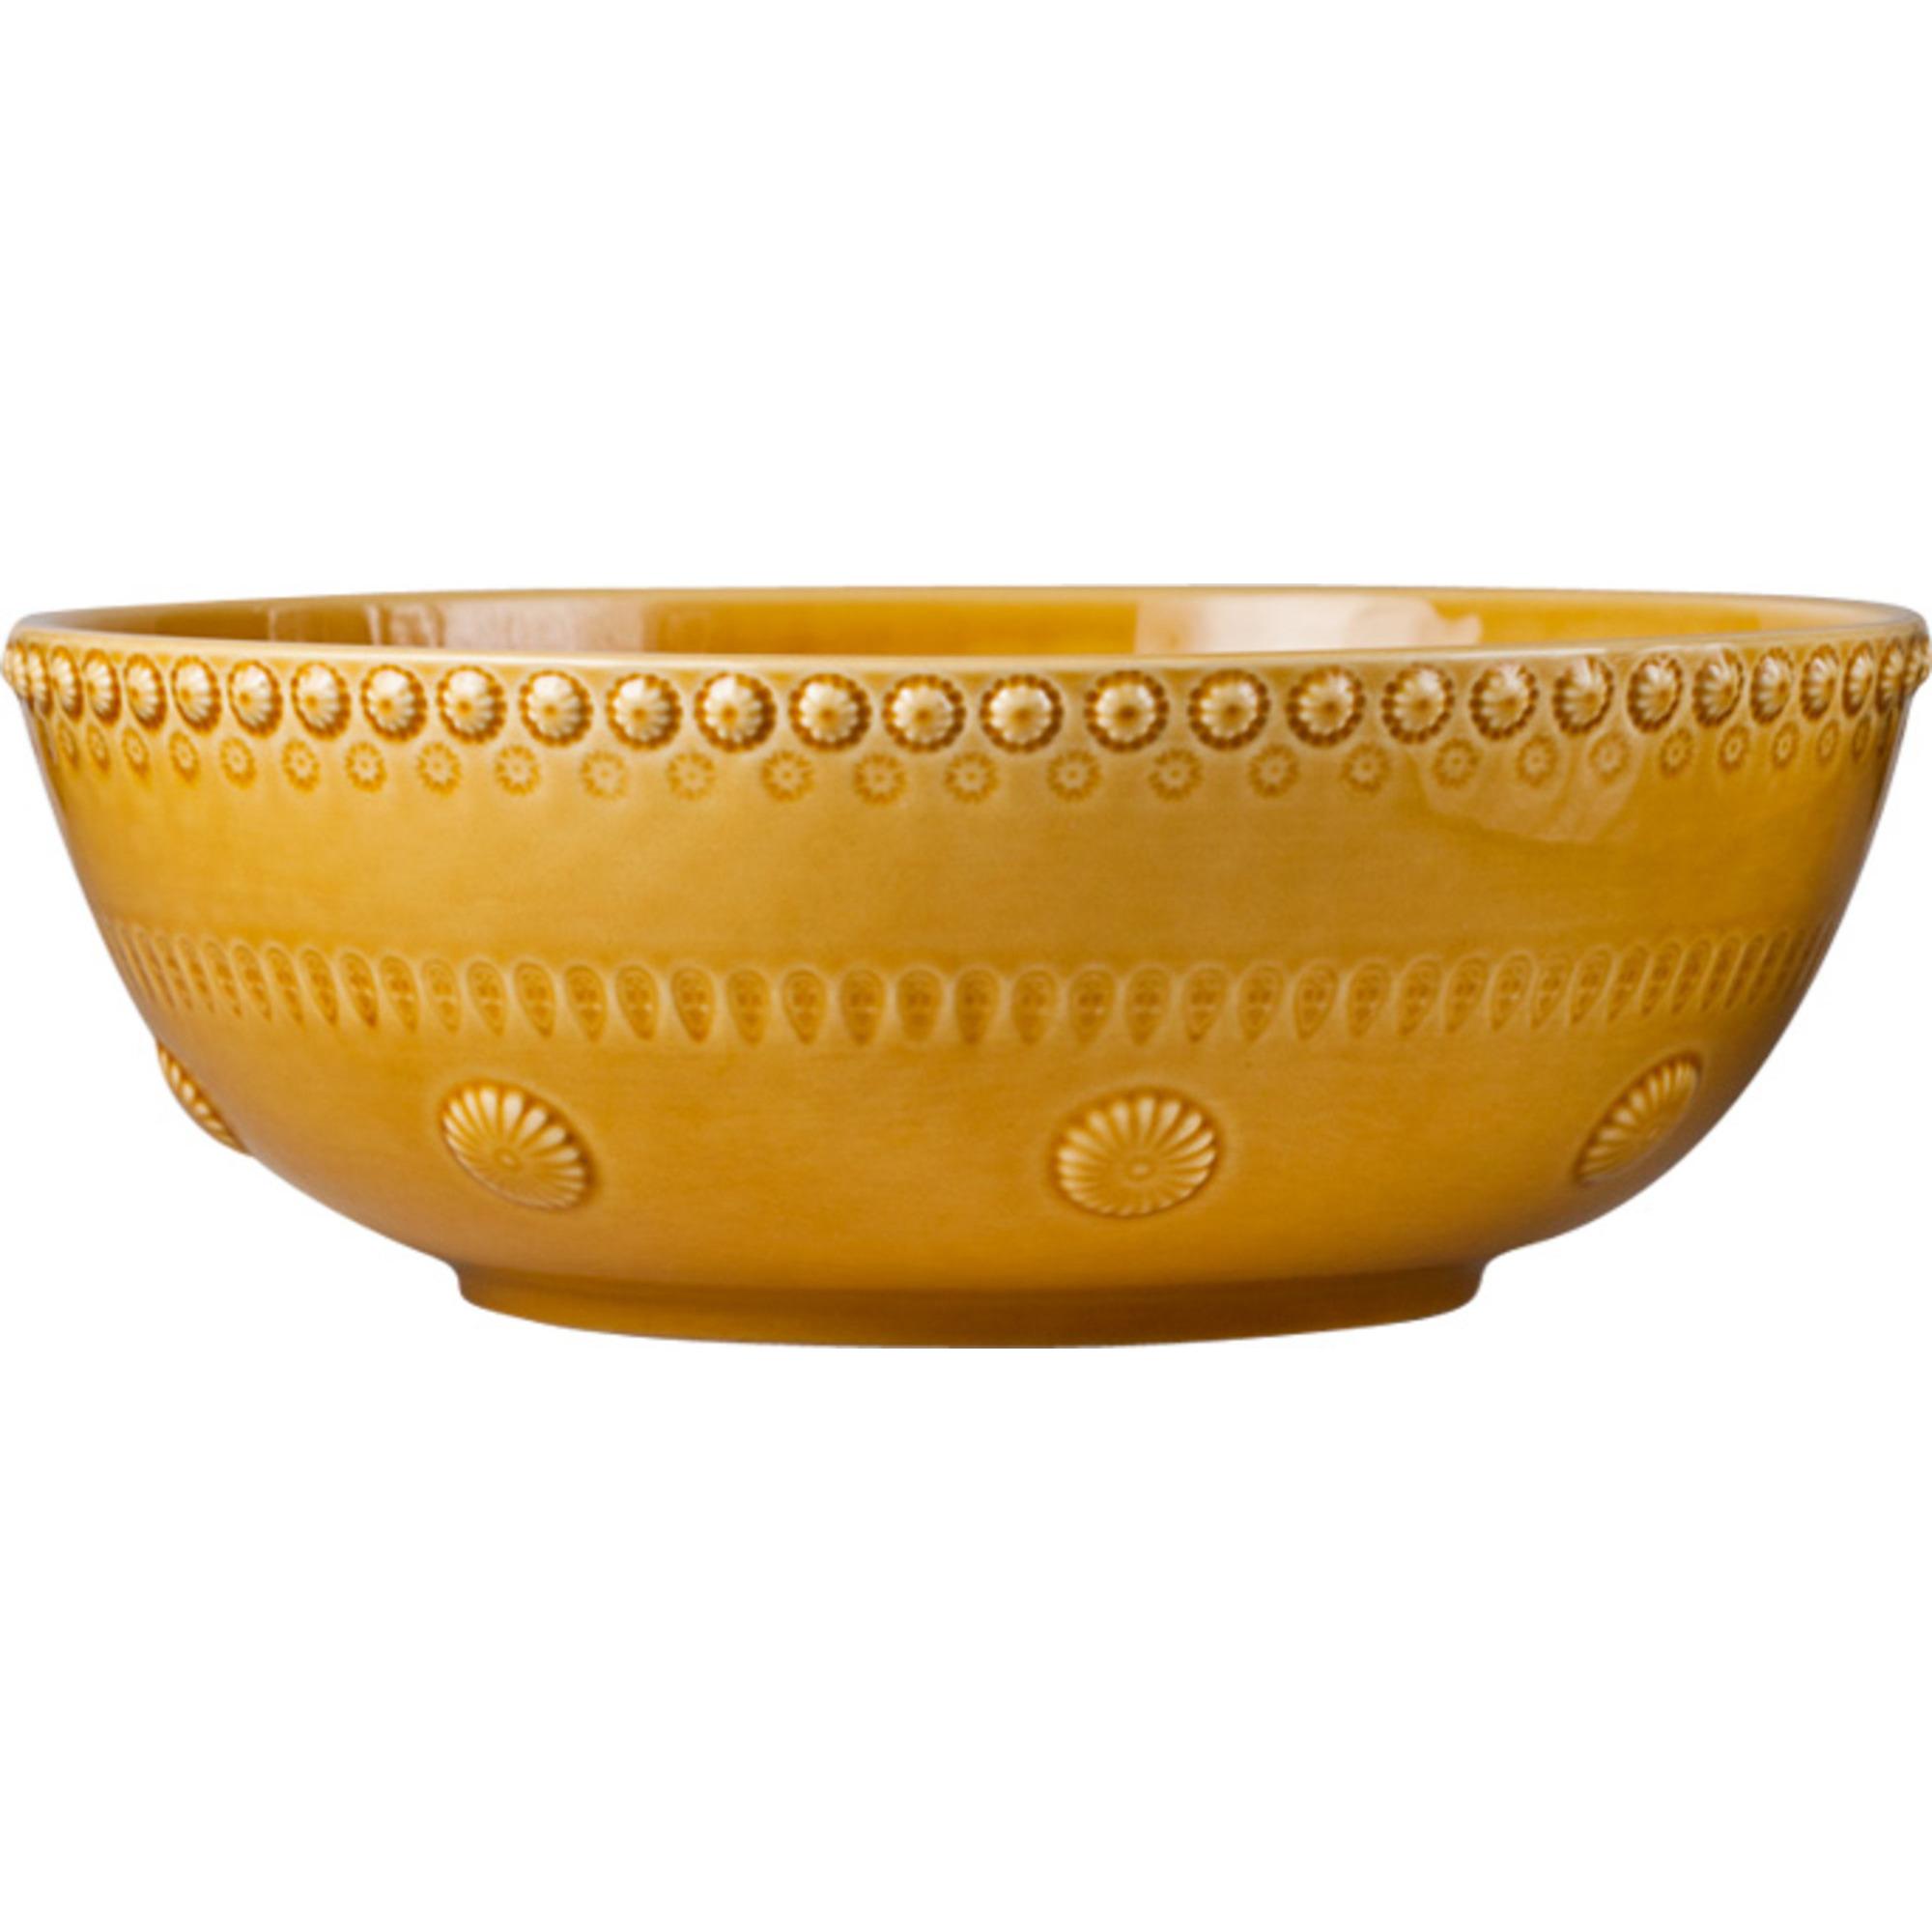 PotteryJo Daisy Salladsskål 30 cm Sienna